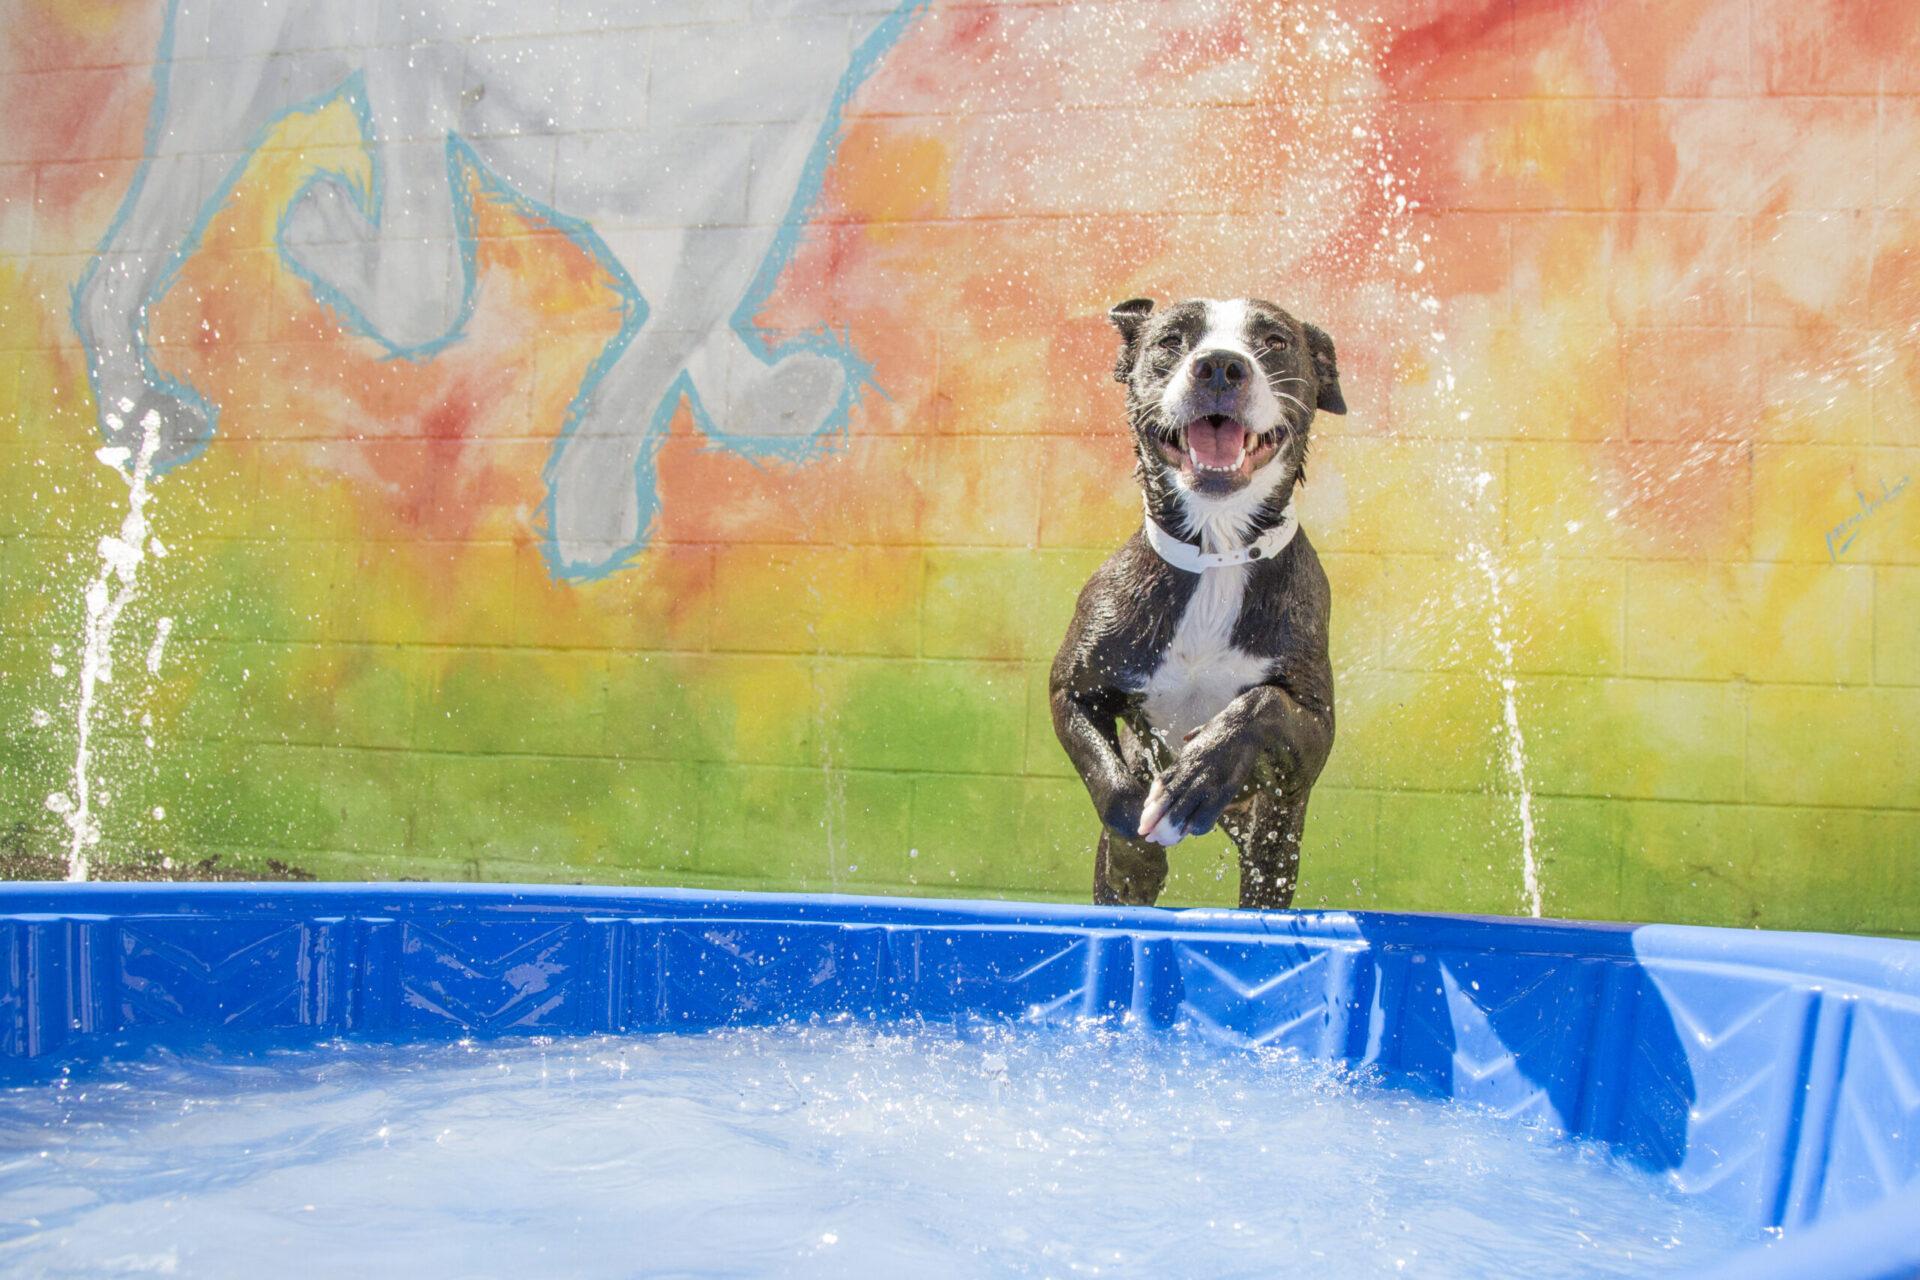 Happy pitbull mix jumping into pool